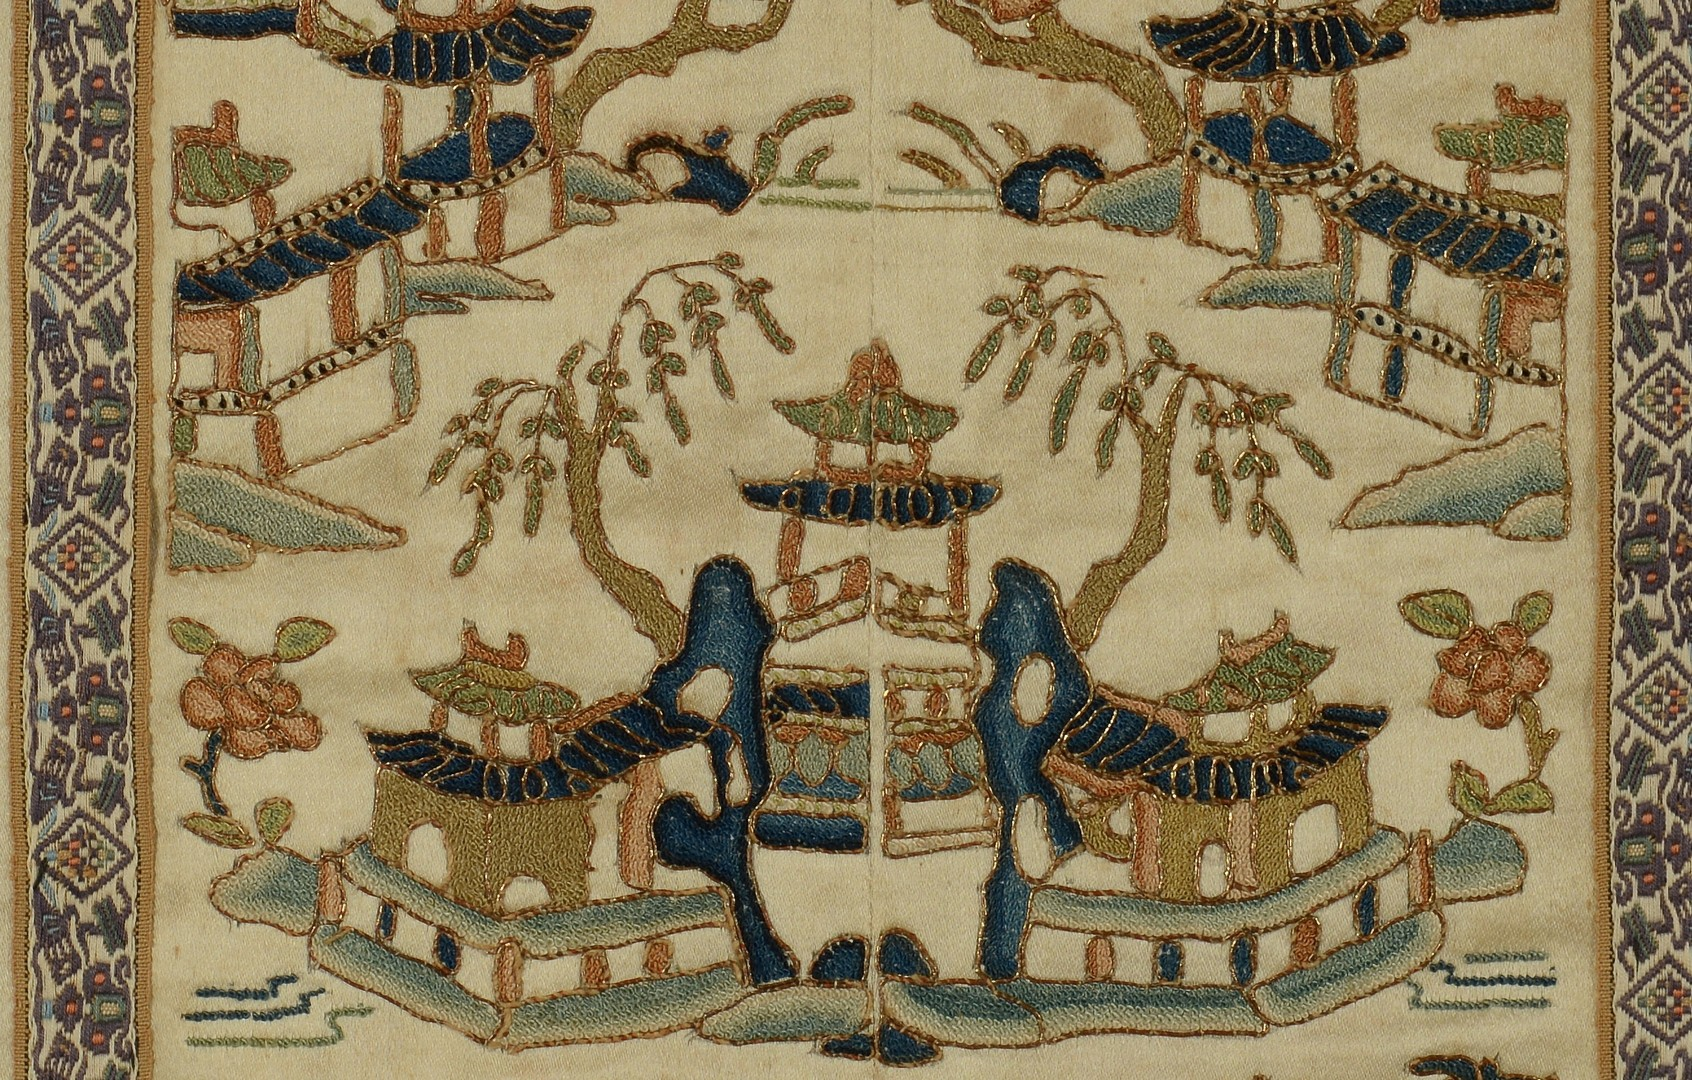 Lot 3383183: Pr. Chinese Embroideries w/ Forbidden Stitchery